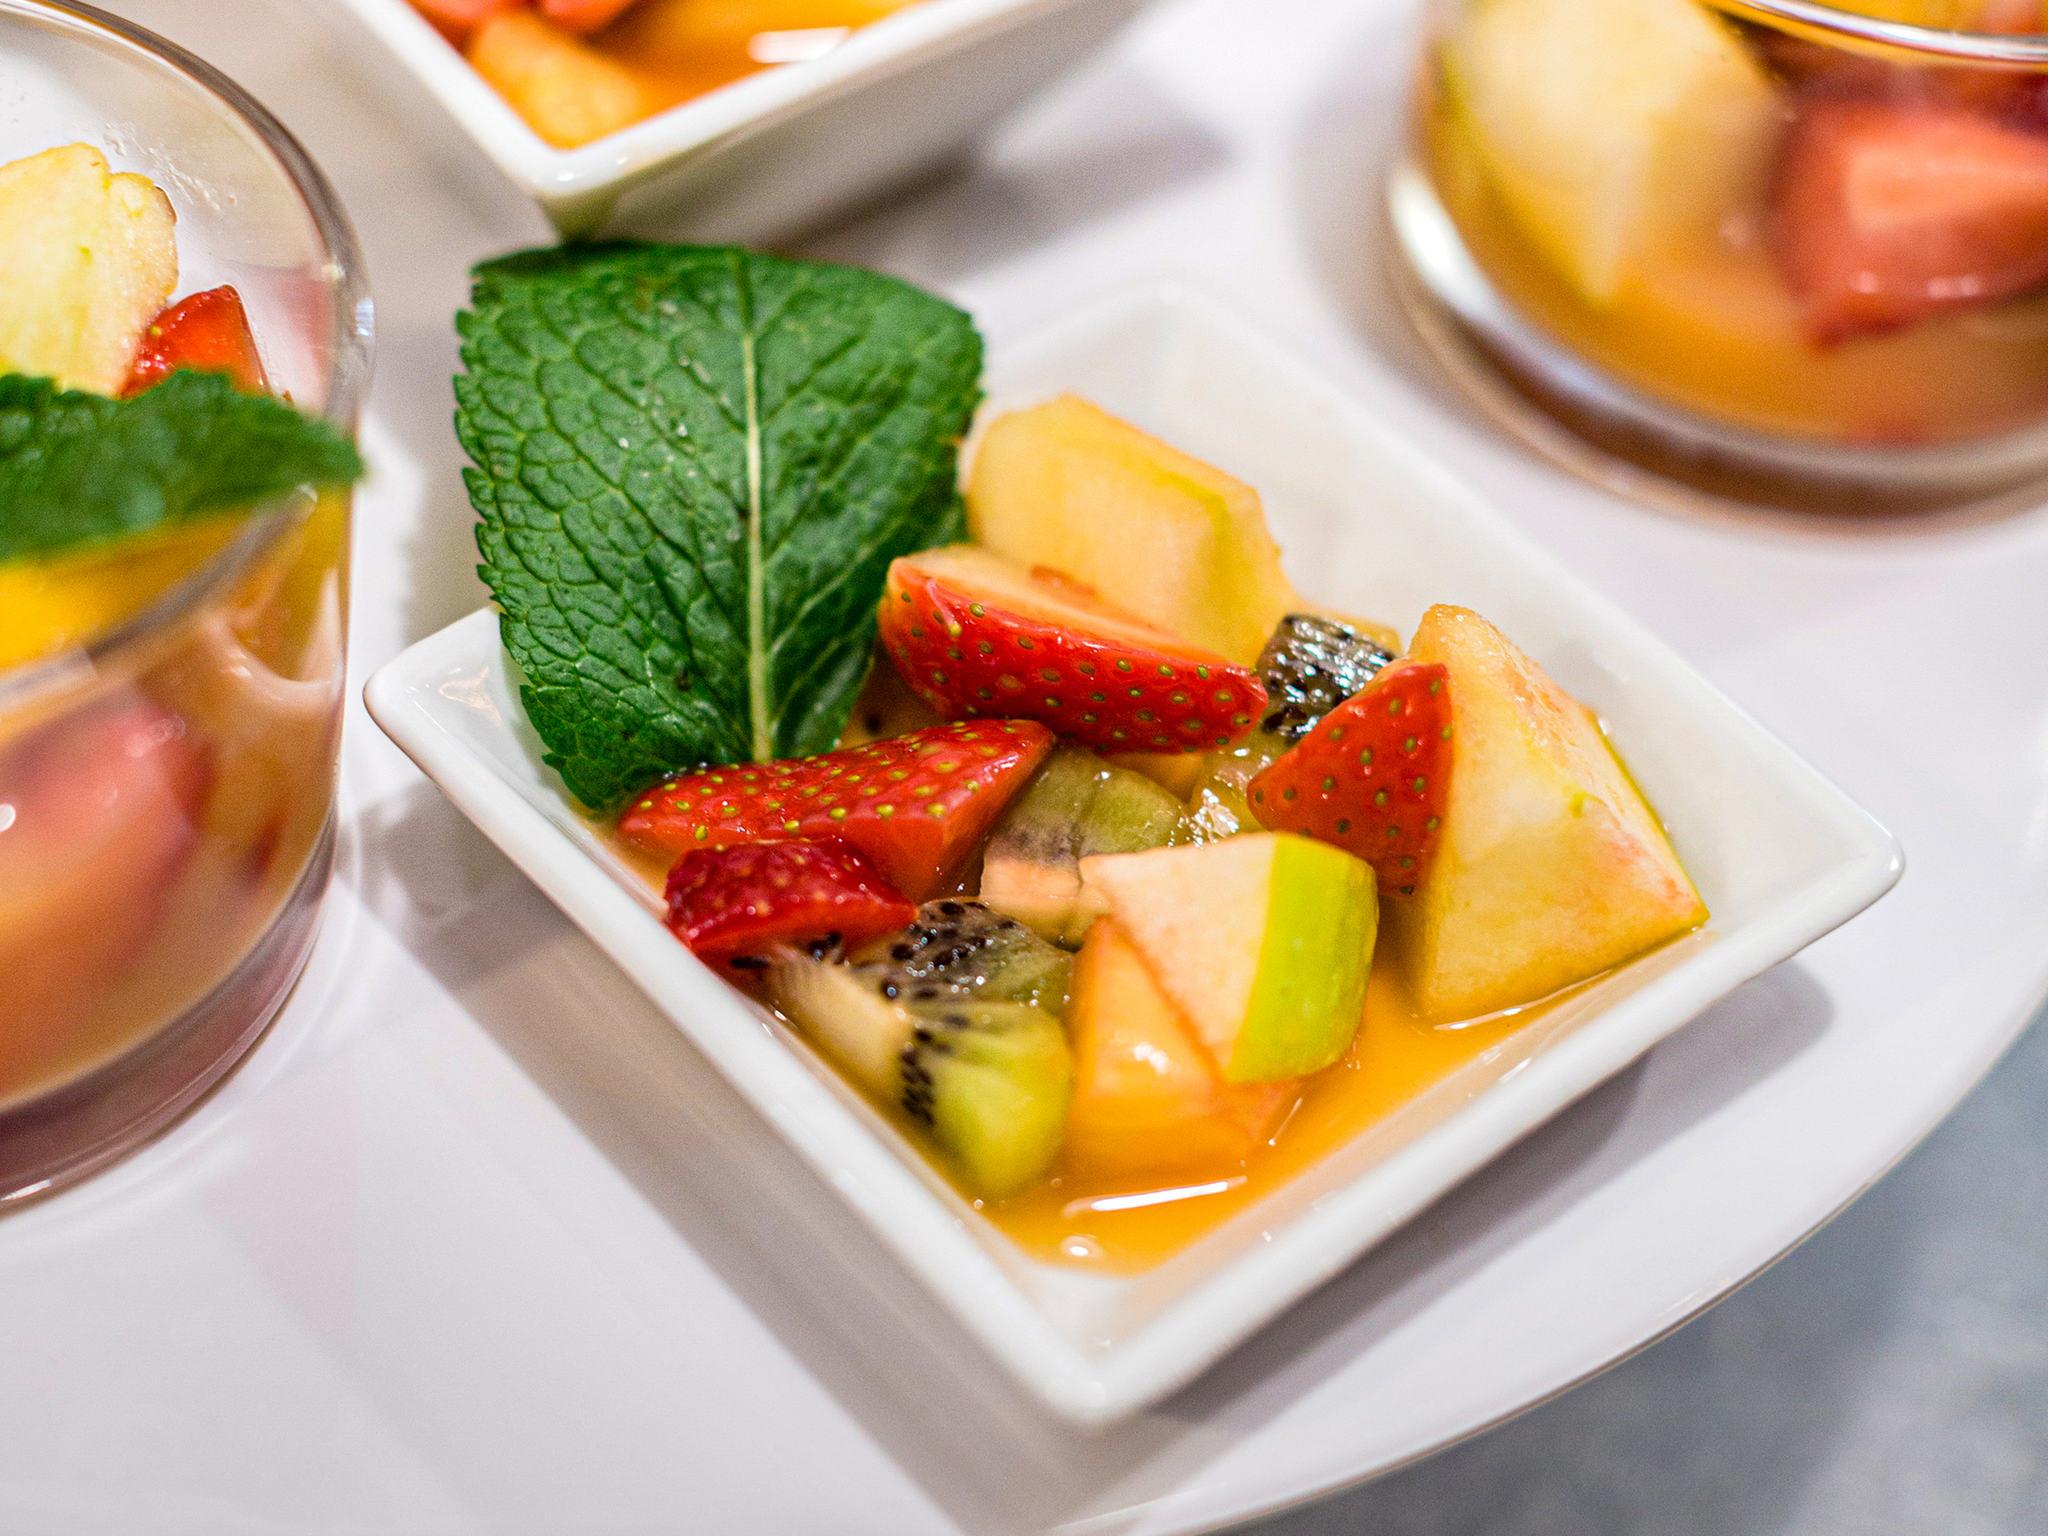 Hotel In Toulouse Ibis Universit The Little Things She Needs Kashira 2b Brown Cokelat 38 Restaurant